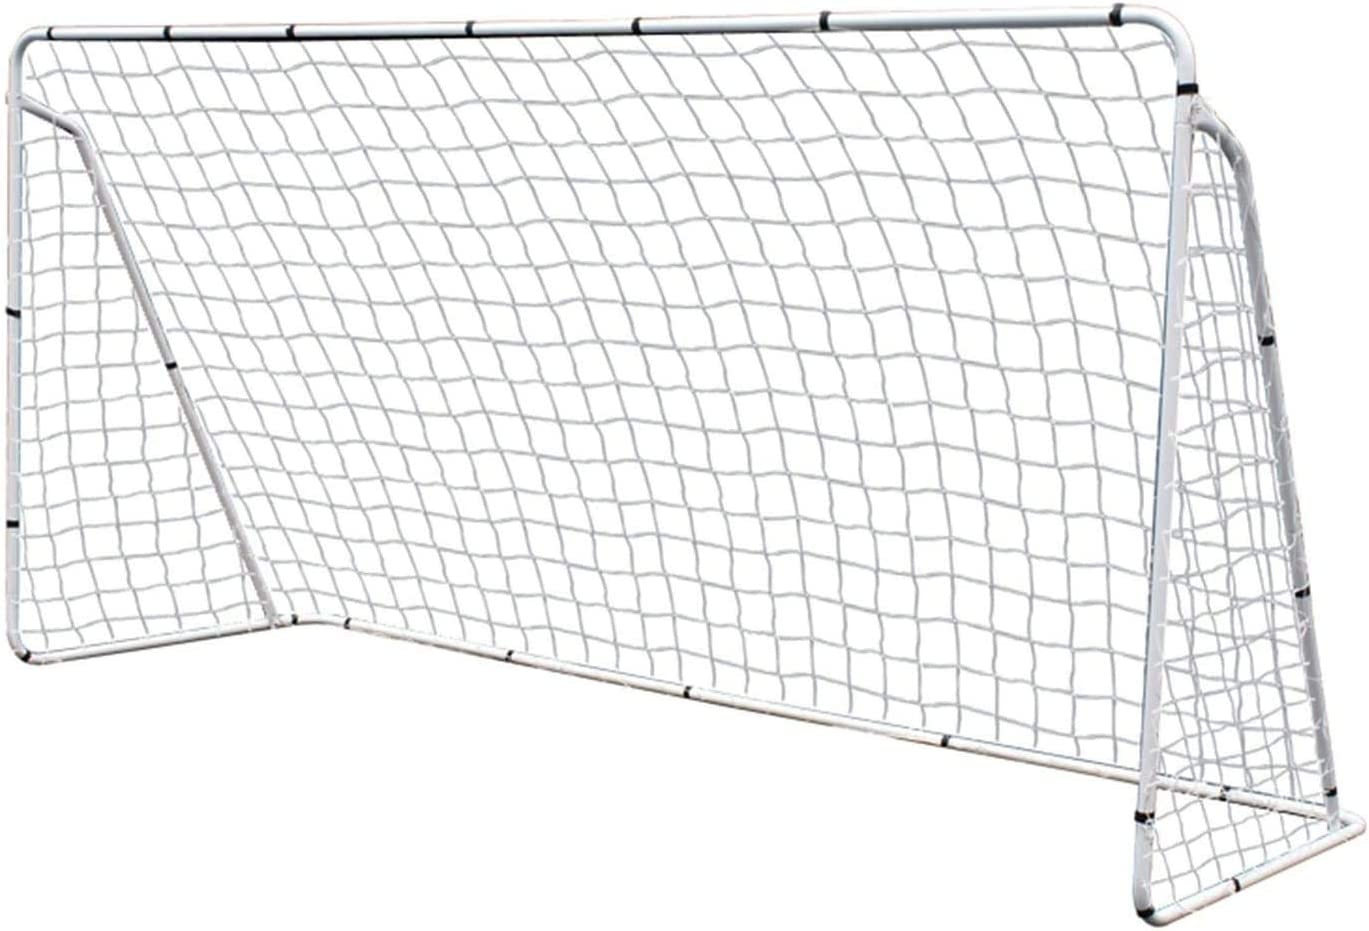 excellence Max 71% OFF HomGarden 12' x 6' Portable Soccer Goal Target Net Post Football